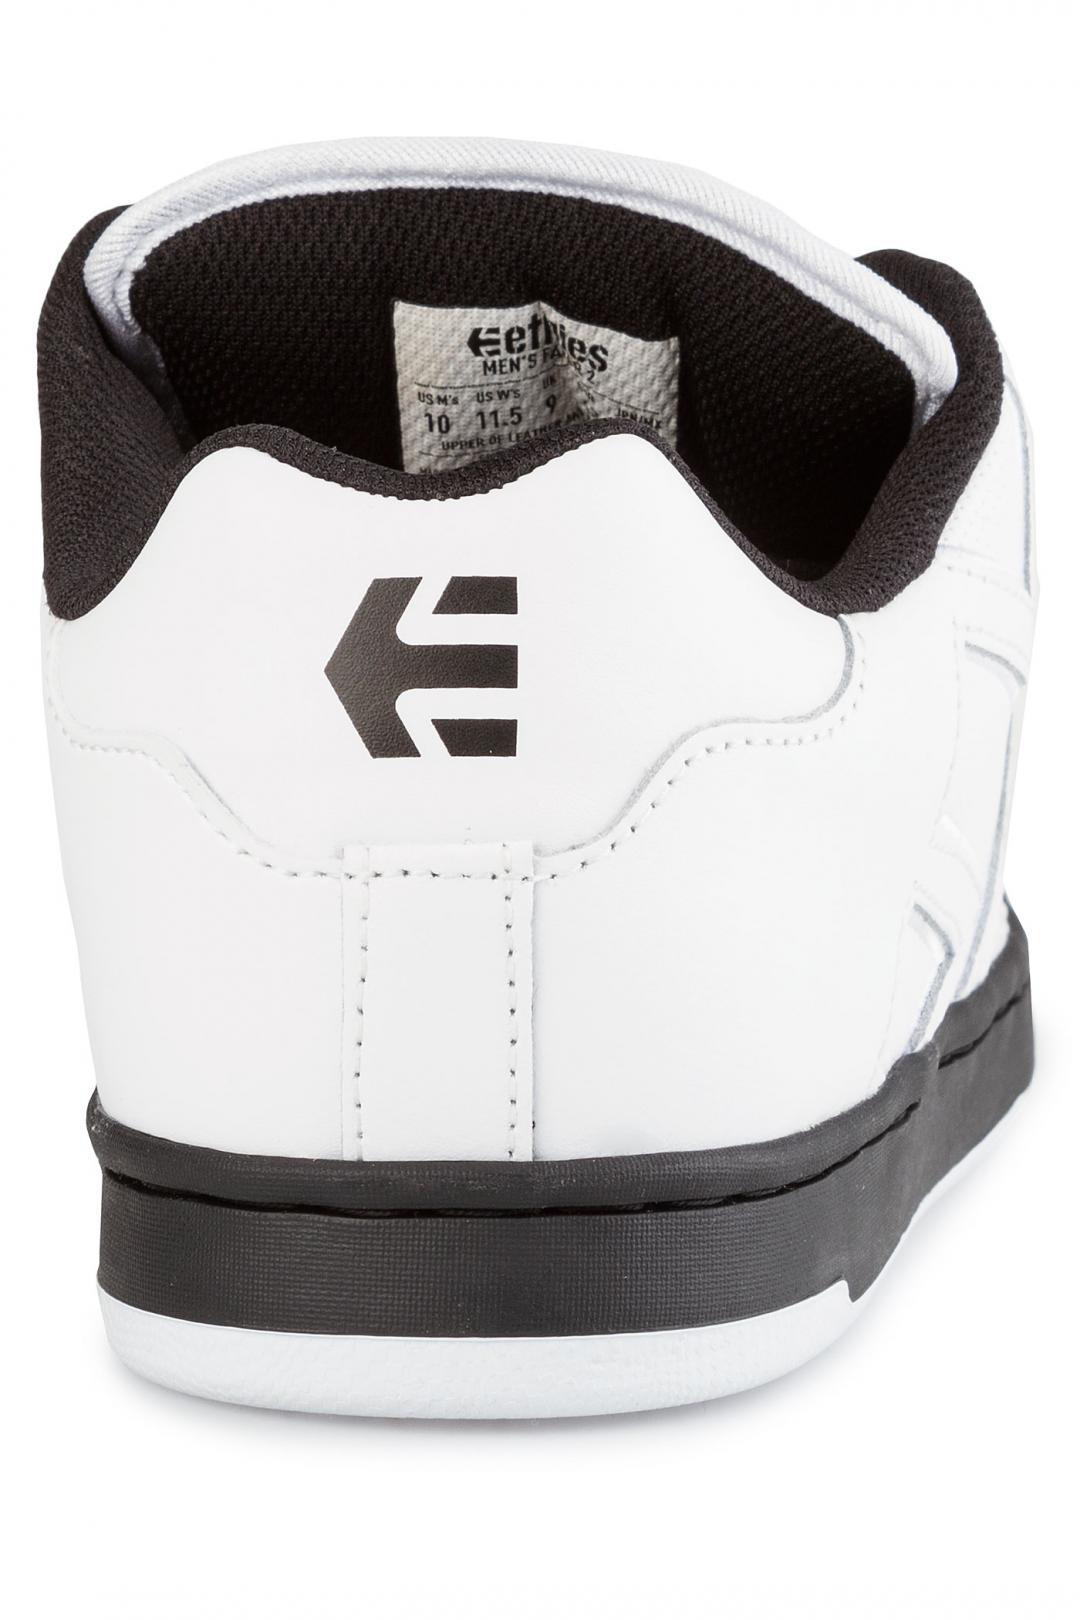 Uomo Etnies Fader 2 white black | Sneakers low top